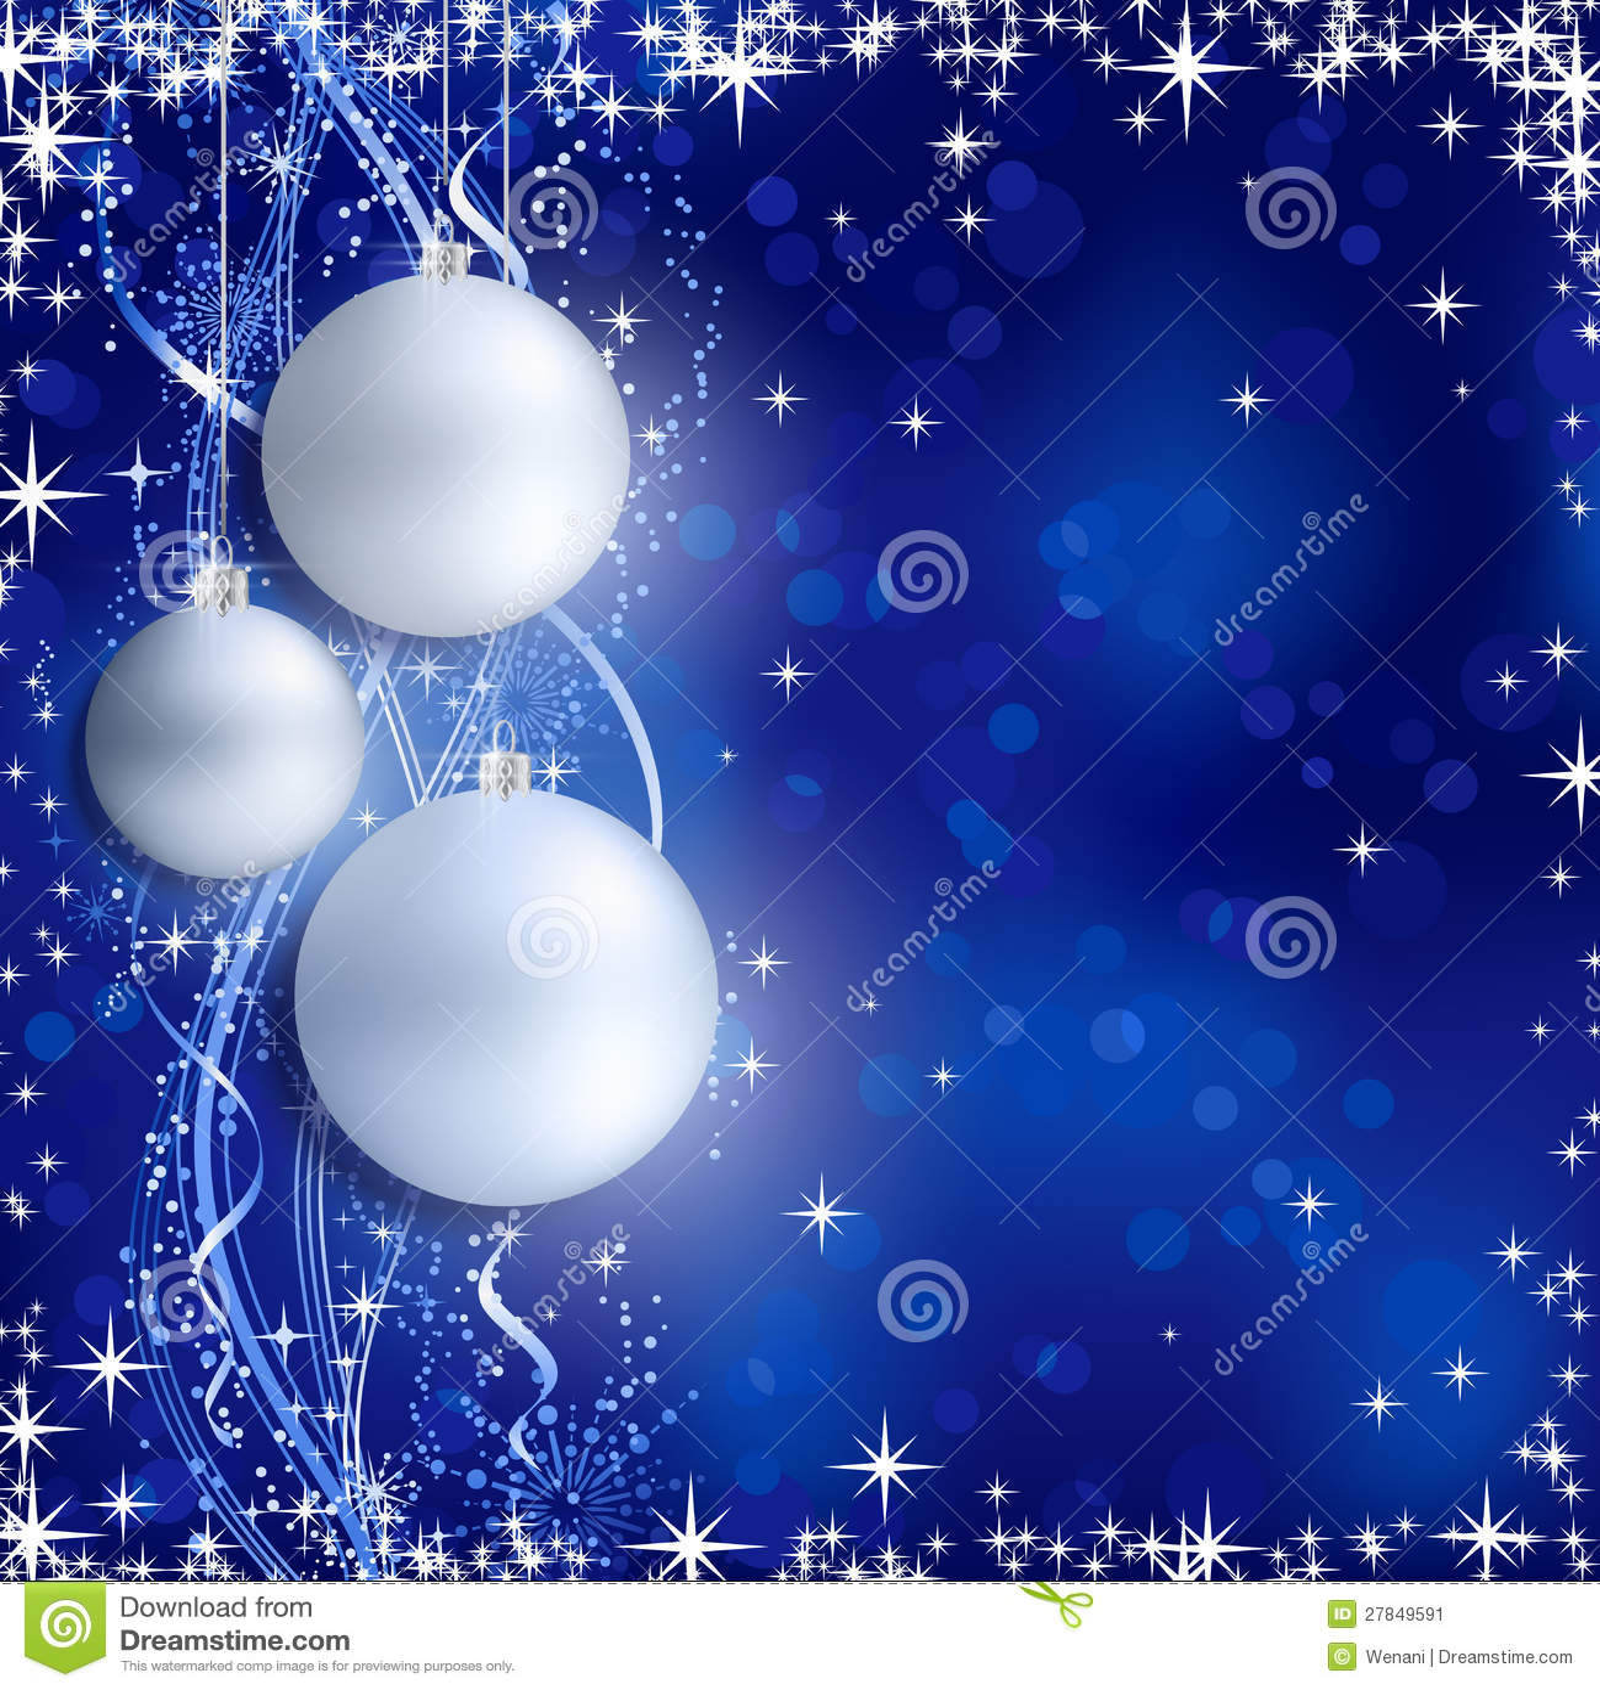 Silver Blue Christmas Background Stock Image - Image: 27849591